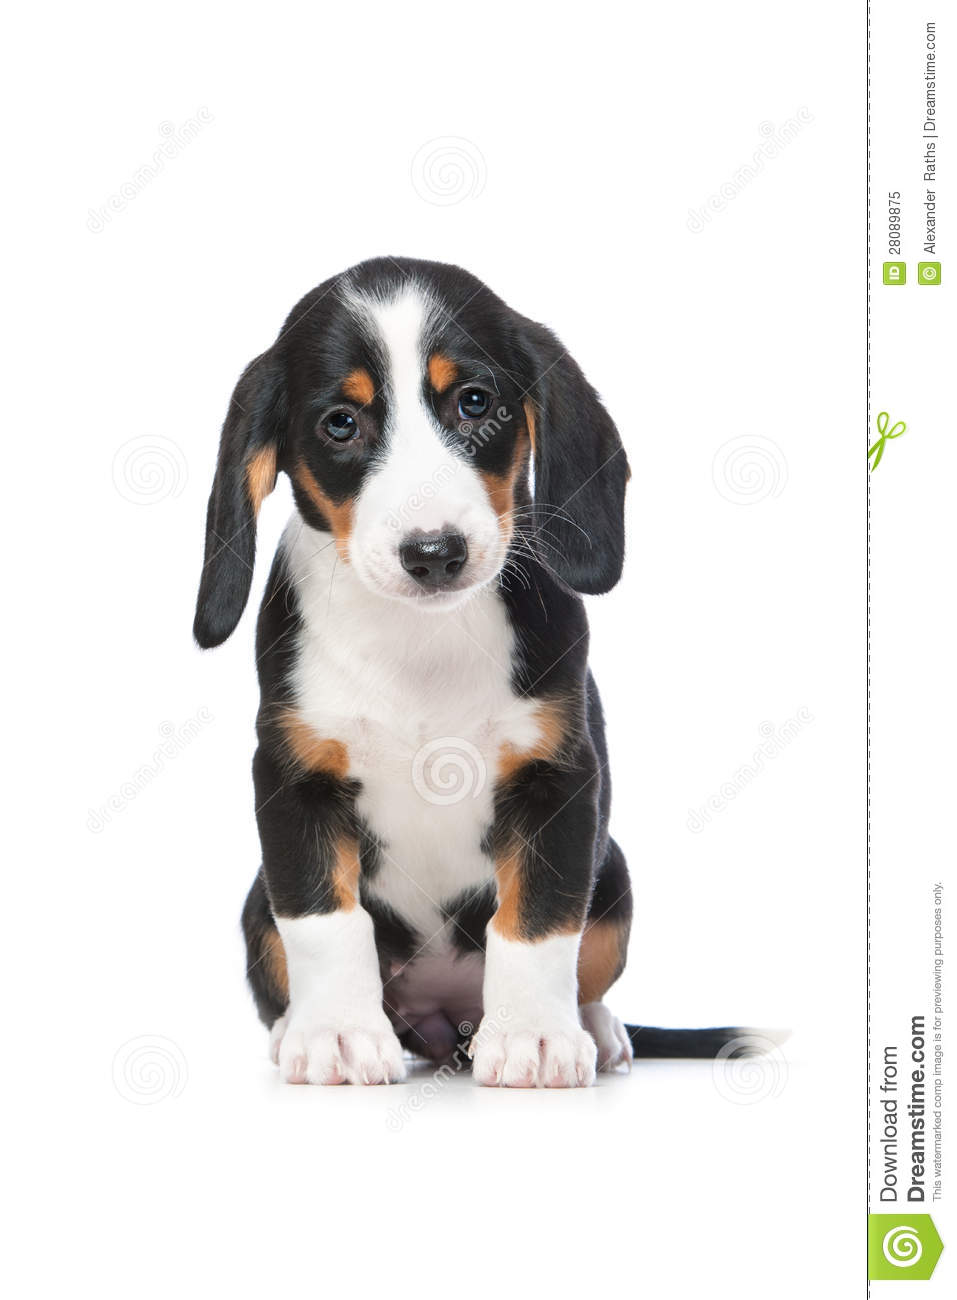 Westphalian Dachsbracke Dog: Westphalian Royalty Free Stock Dachshund Puppy Westphalian Dachsbracke Breed